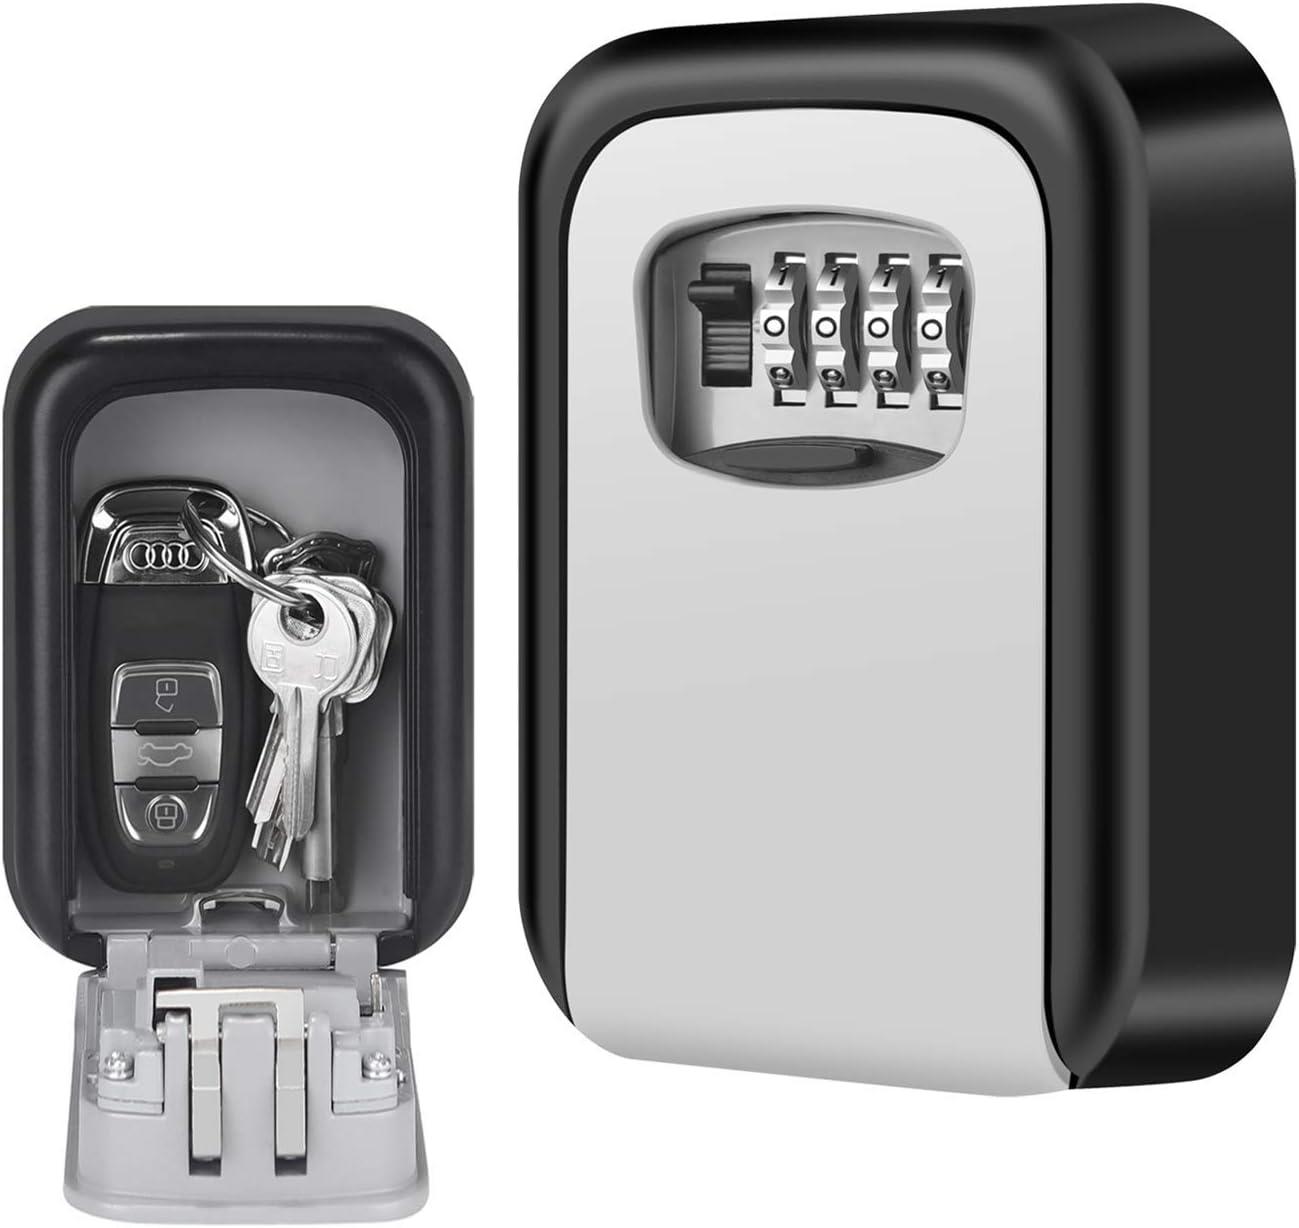 Schlüsselbox Wasserdicht Wandtresor Minitresor Wandmontage Box Schlüsselsafe